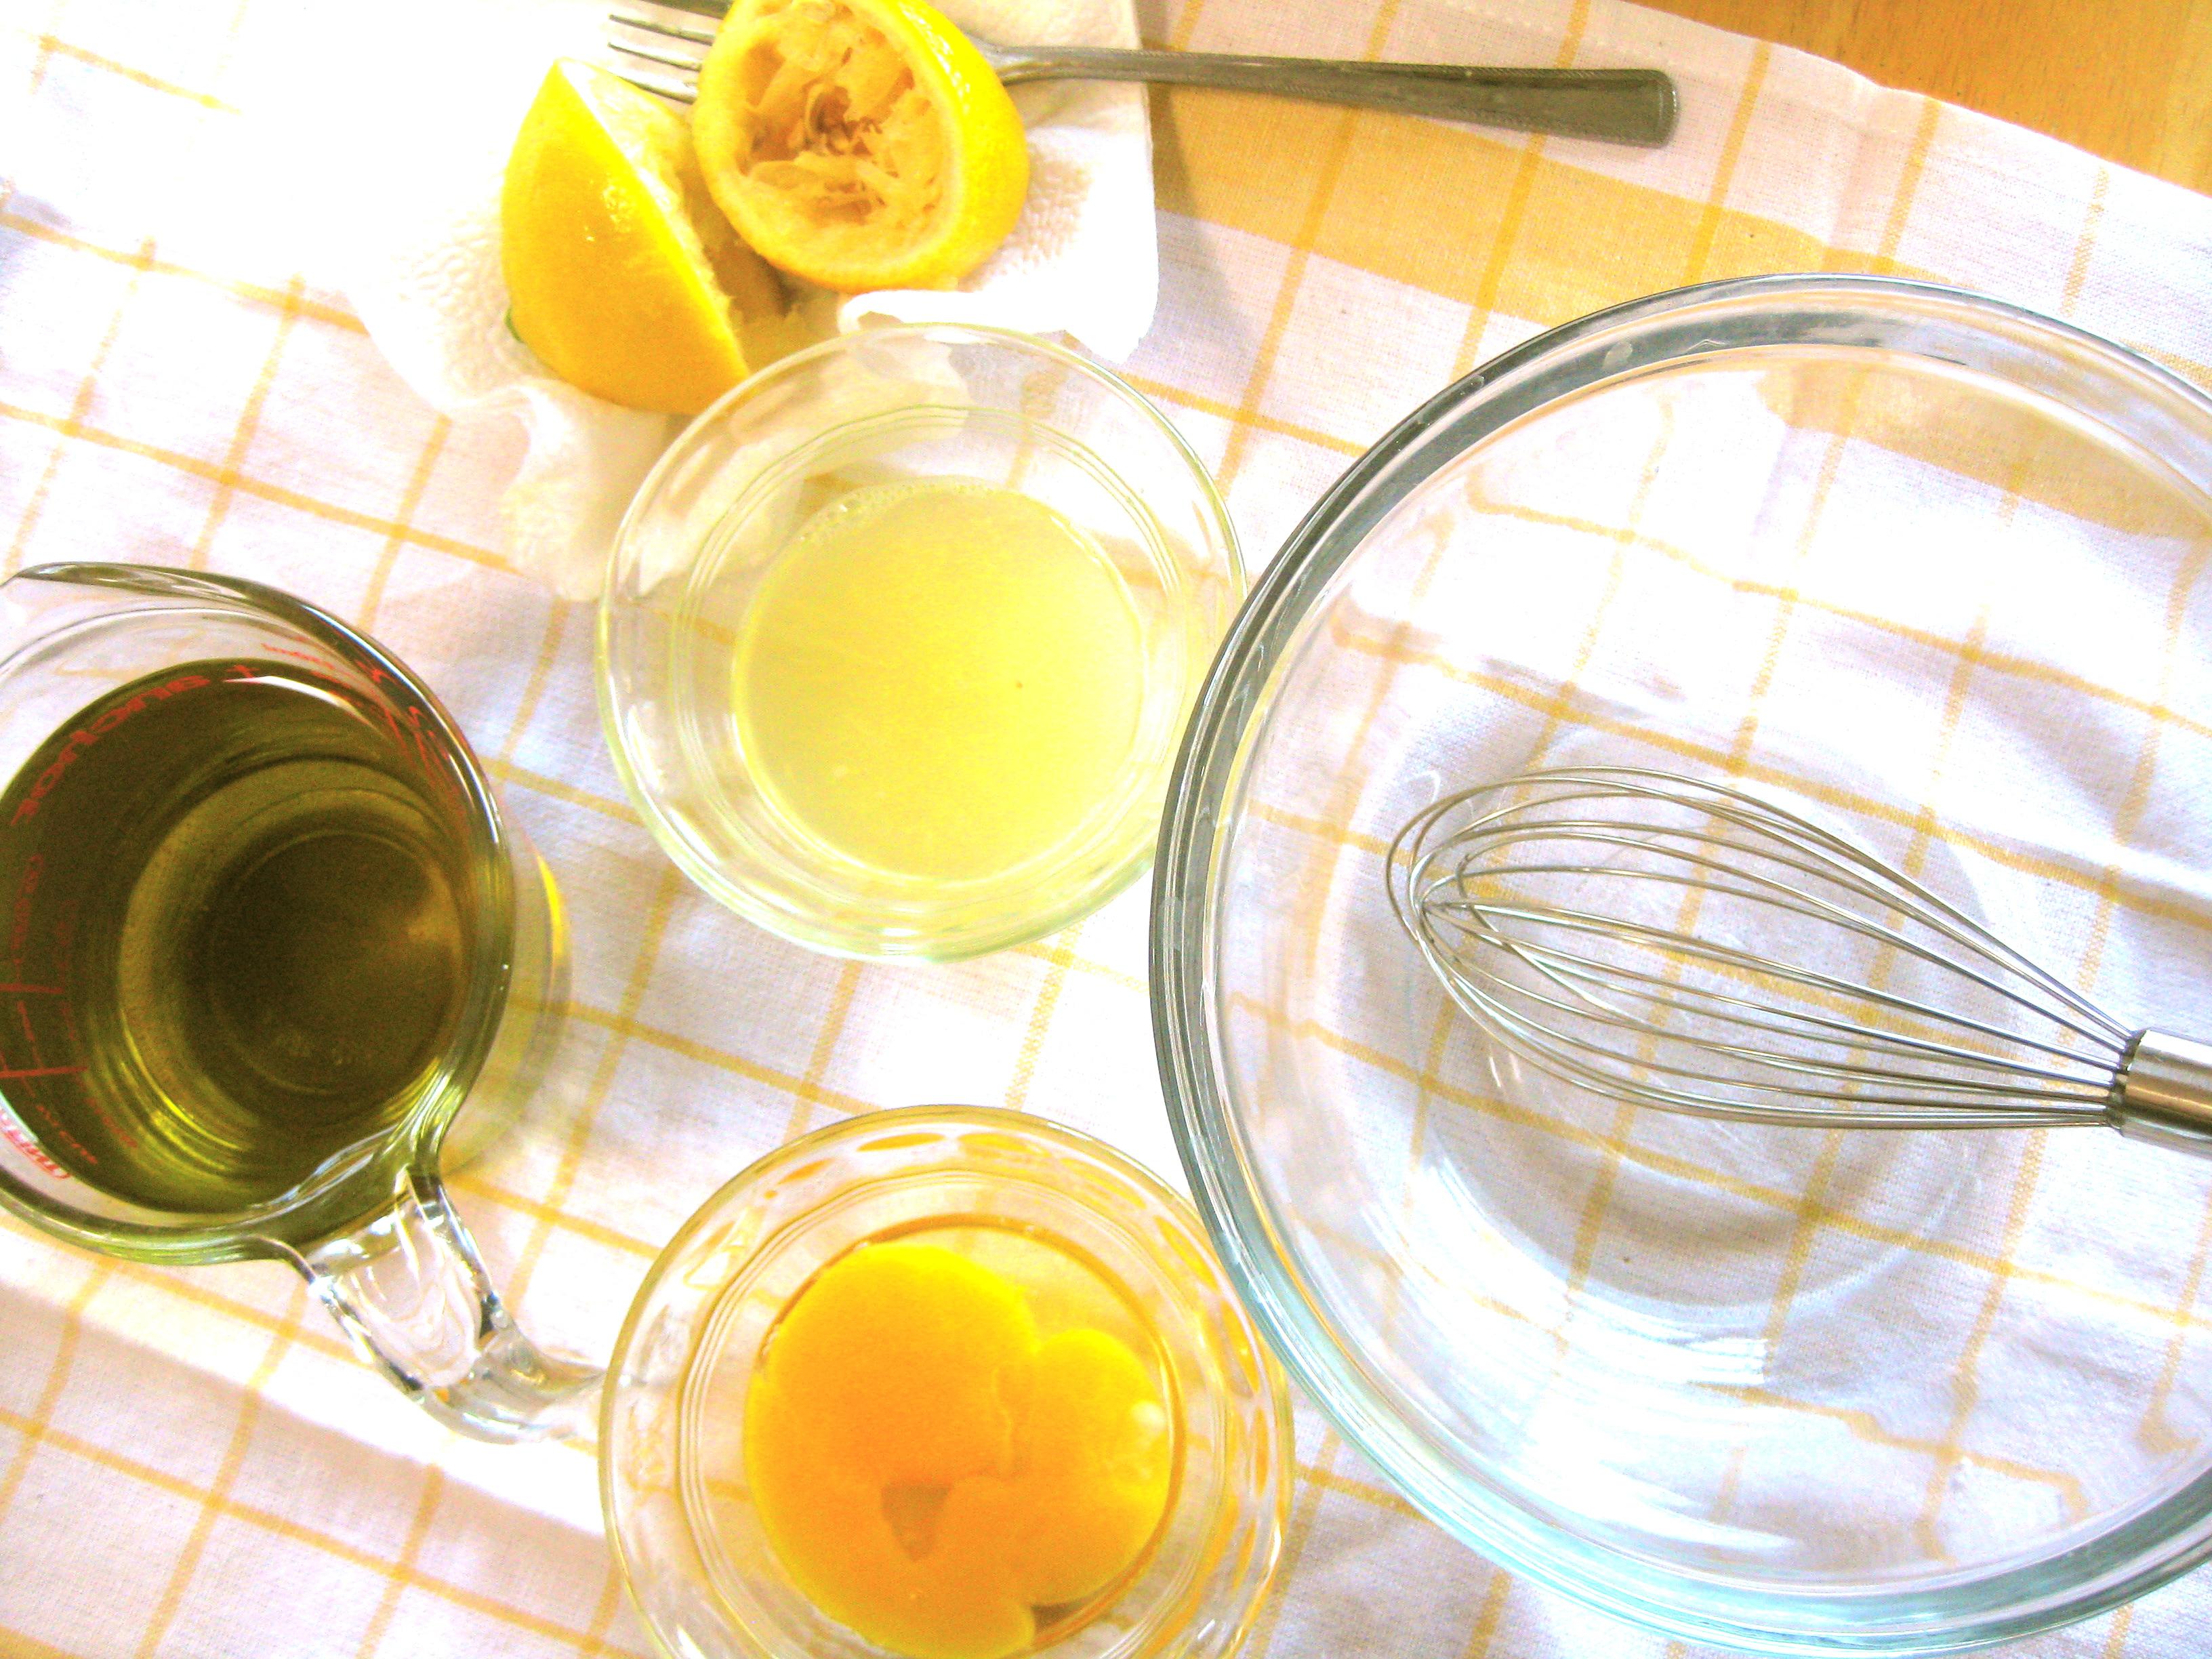 Spanish-style Allioli (Olive Oil And Garlic Mayonnaise) Recipes ...